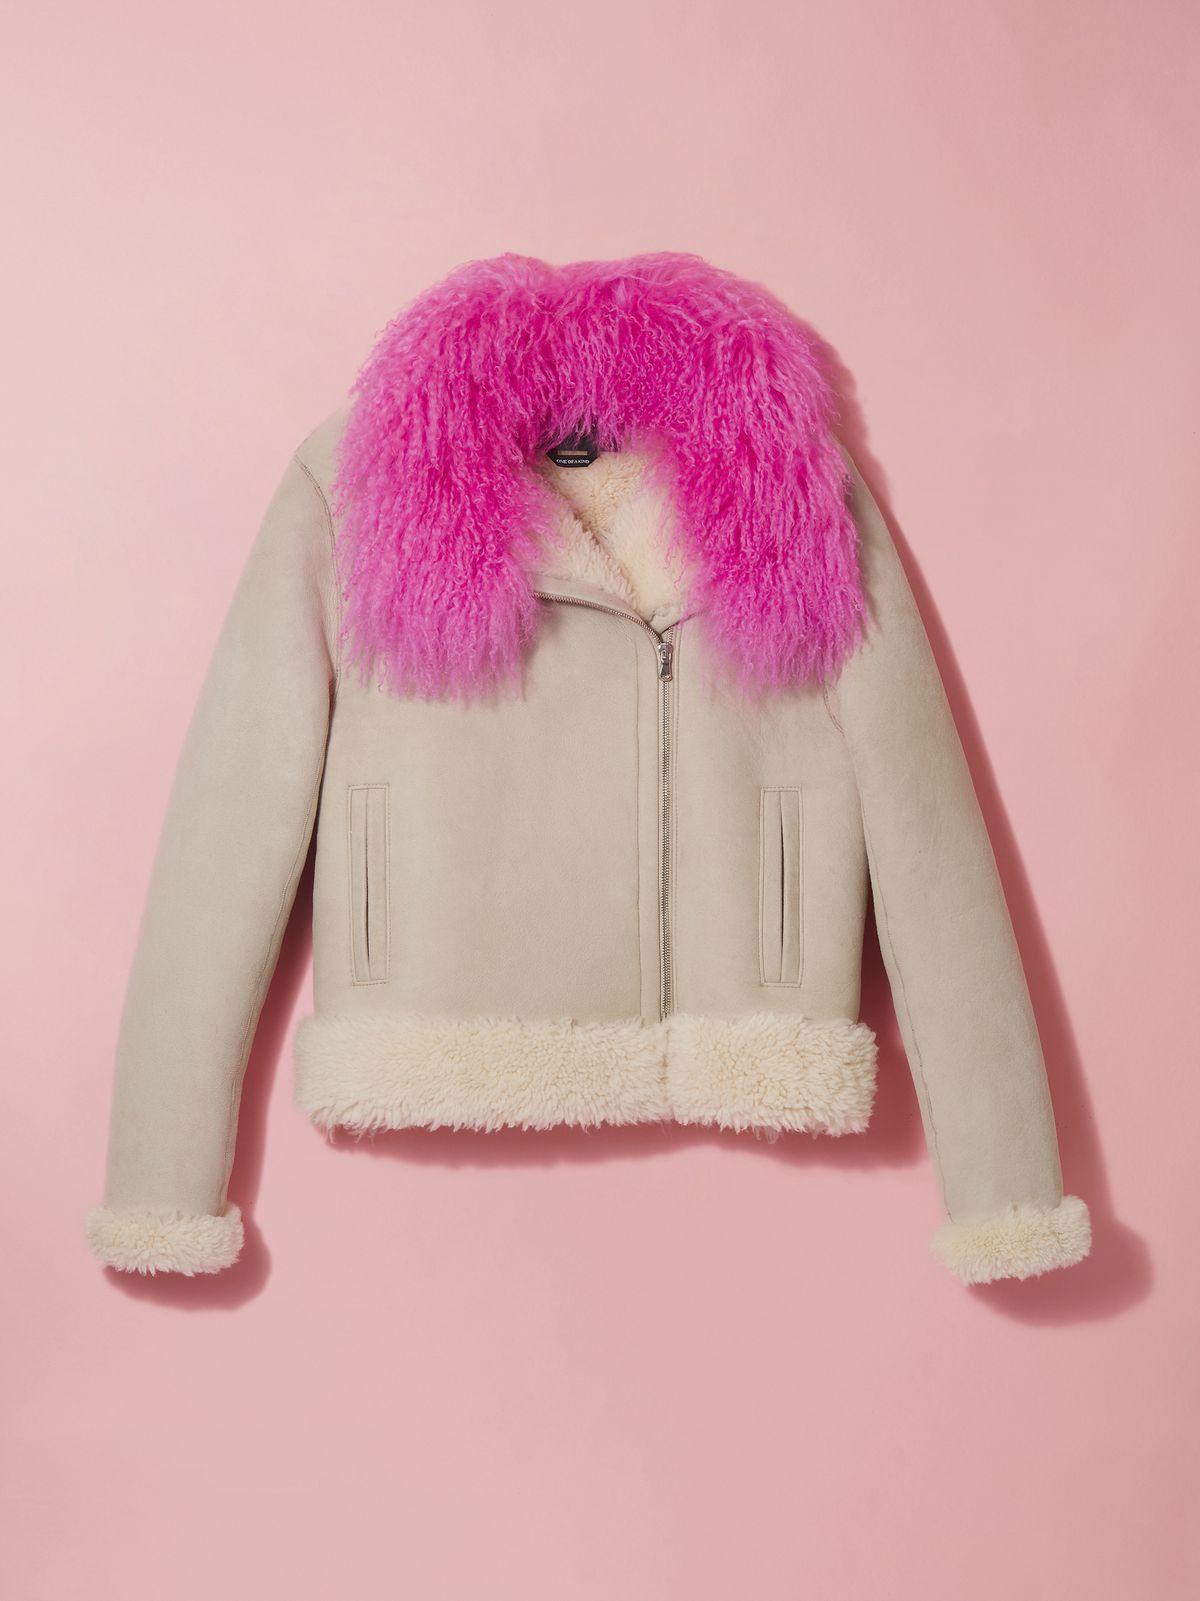 Bebe Rexha x Gilt Shearling Jacket, $4,800